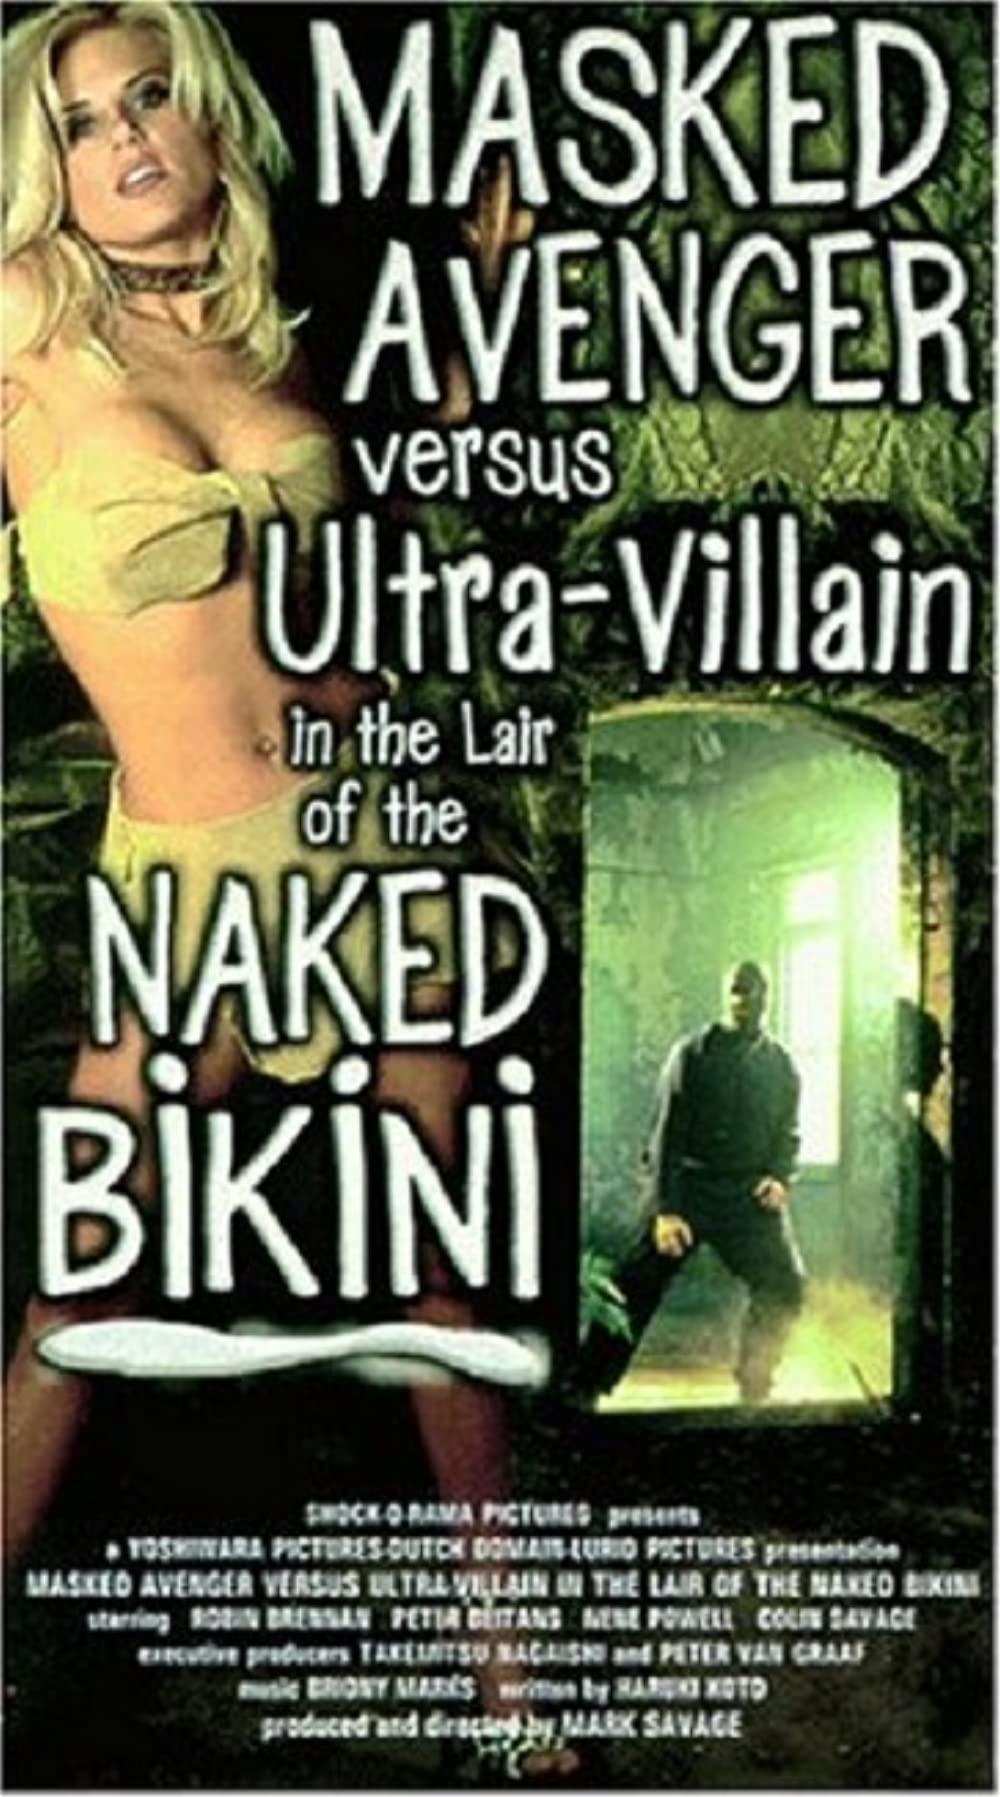 18+ Villain In The Lair Of The Naked Bikini 2000 English 250MB BluRay 480p